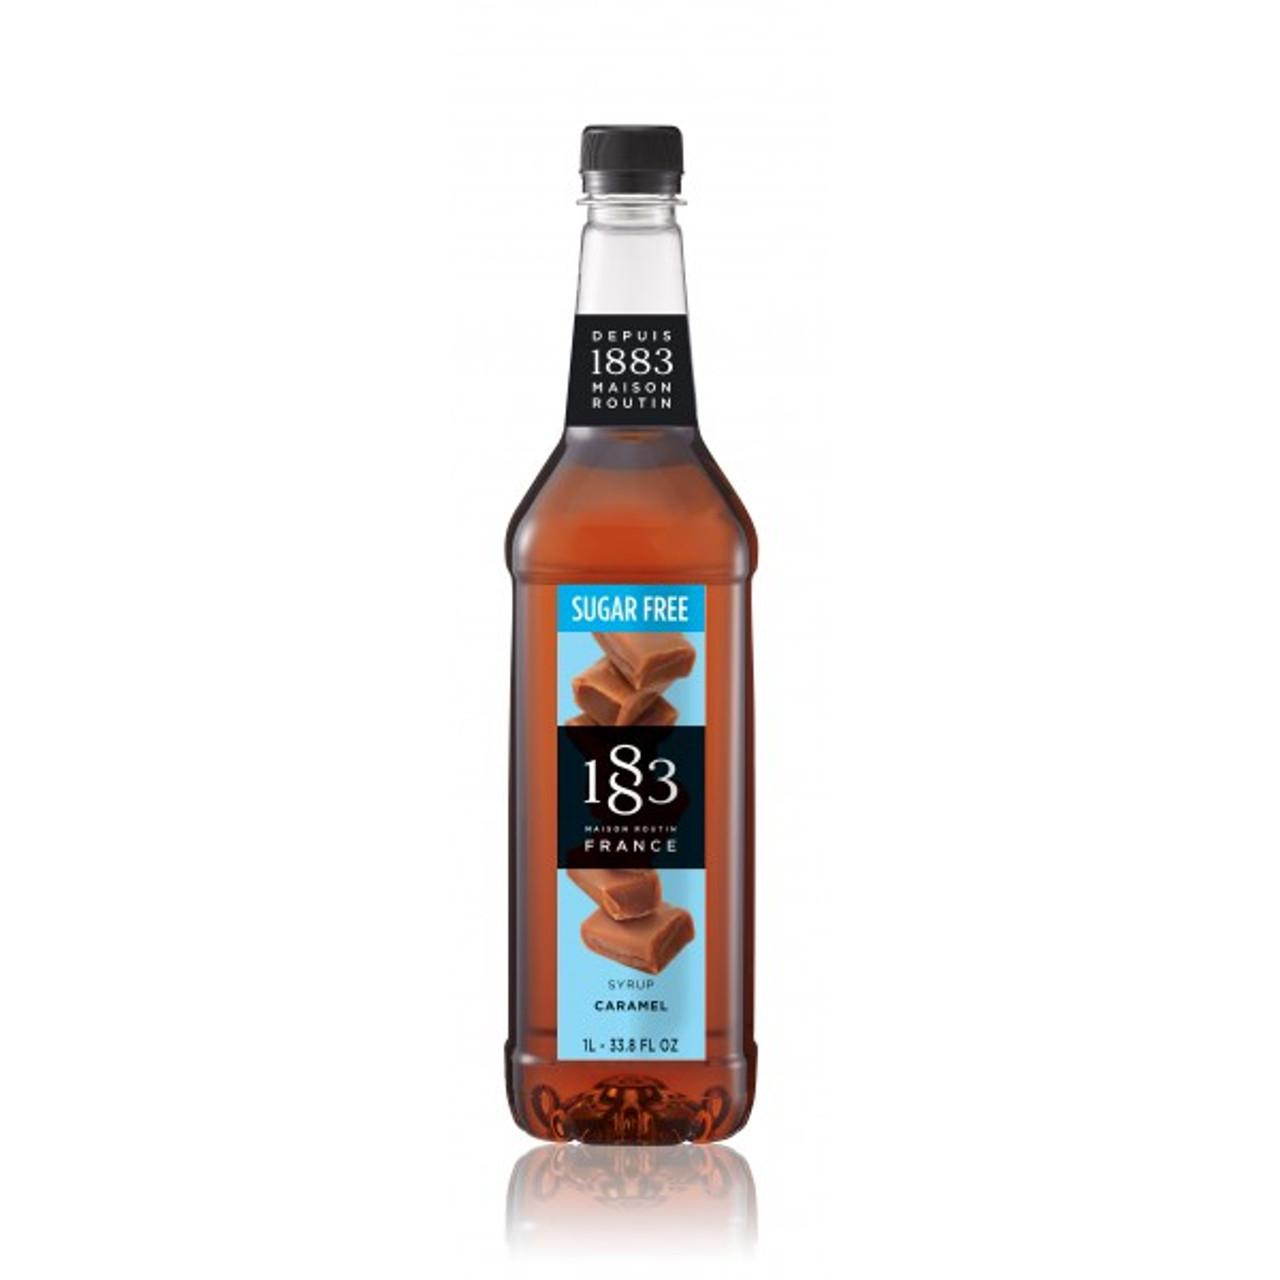 1883 Syrup Sugar Free Caramel - 1L (Plastic Bottle)